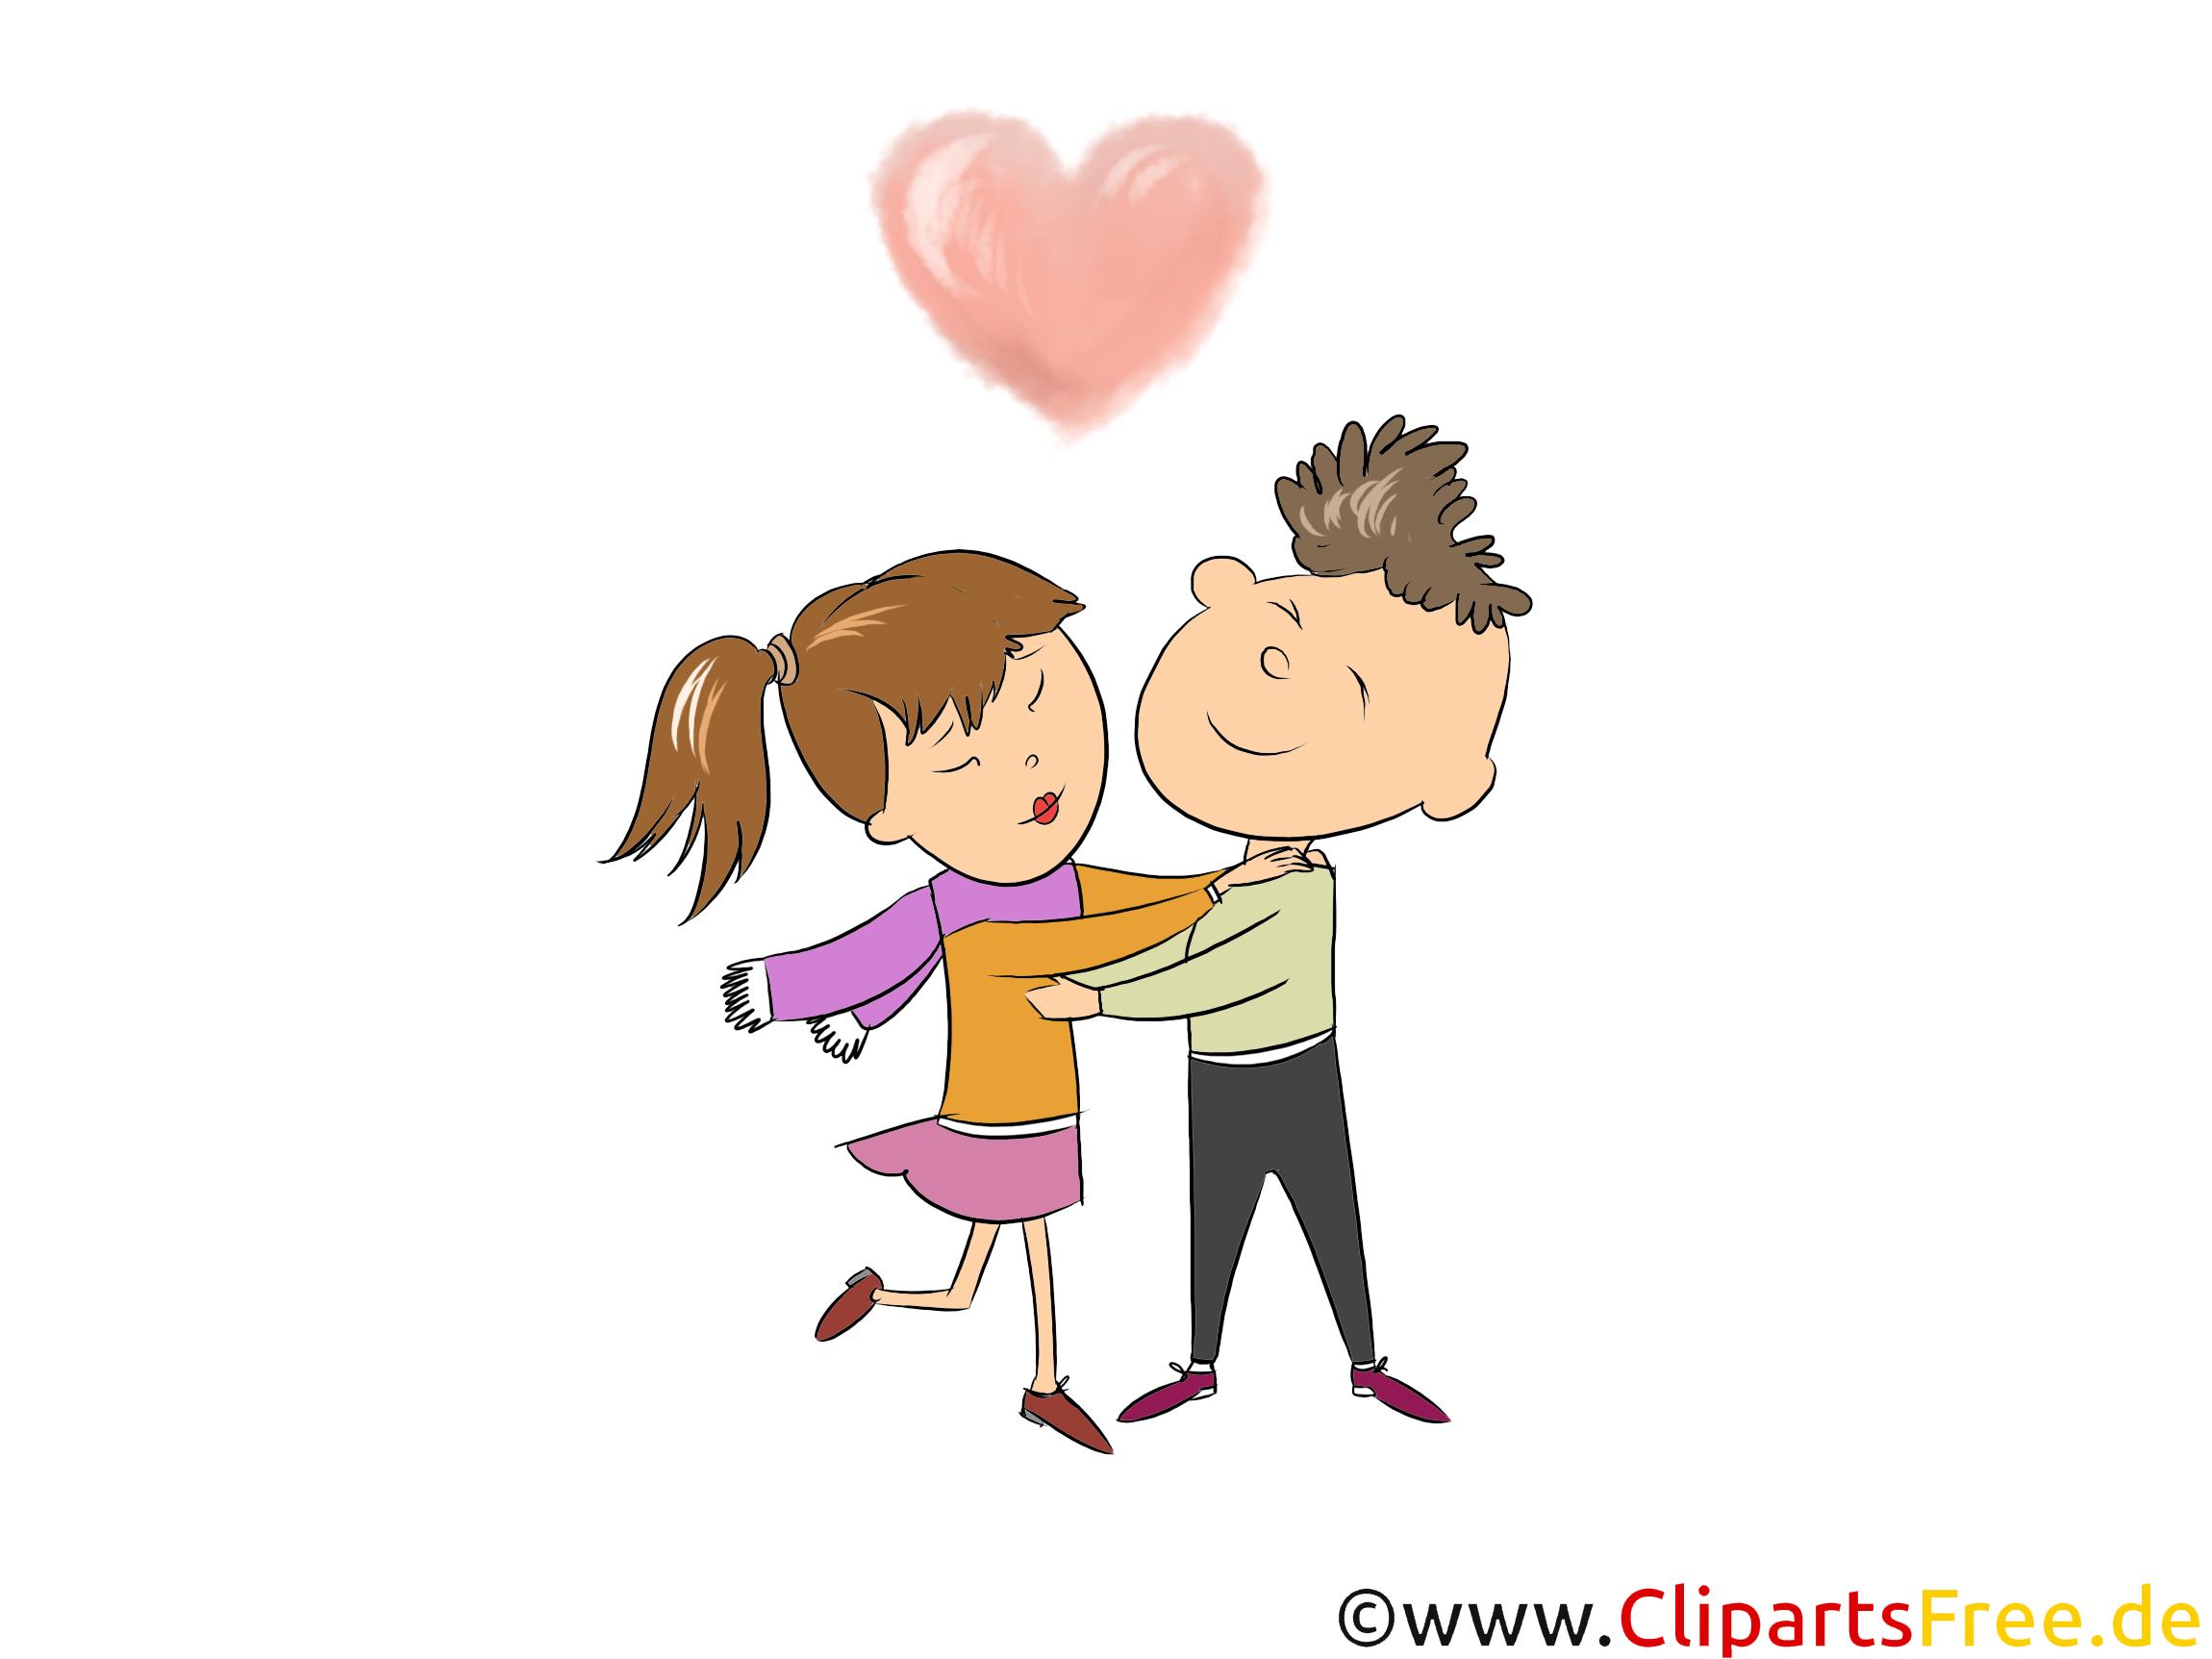 Partnersuche Clipart, Bild, Illustration